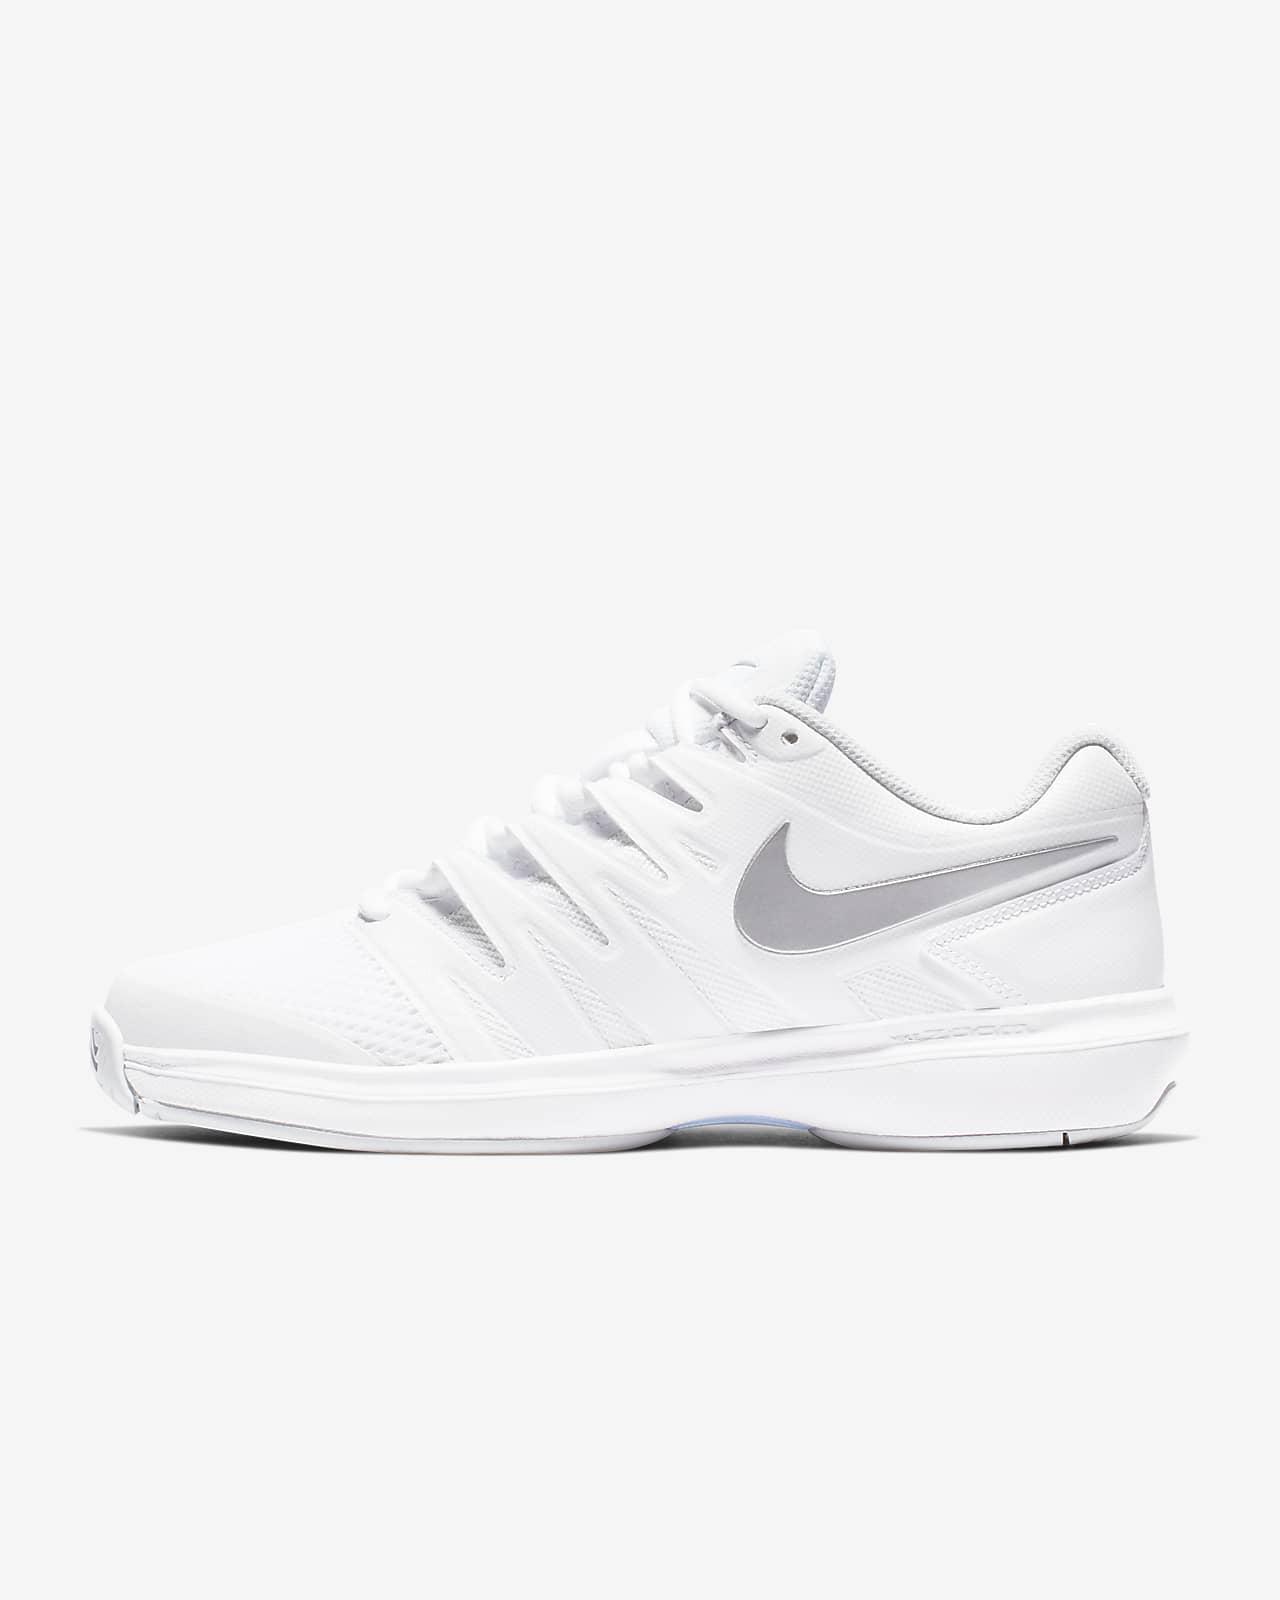 NikeCourt Air Zoom Prestige Women's Tennis Shoes